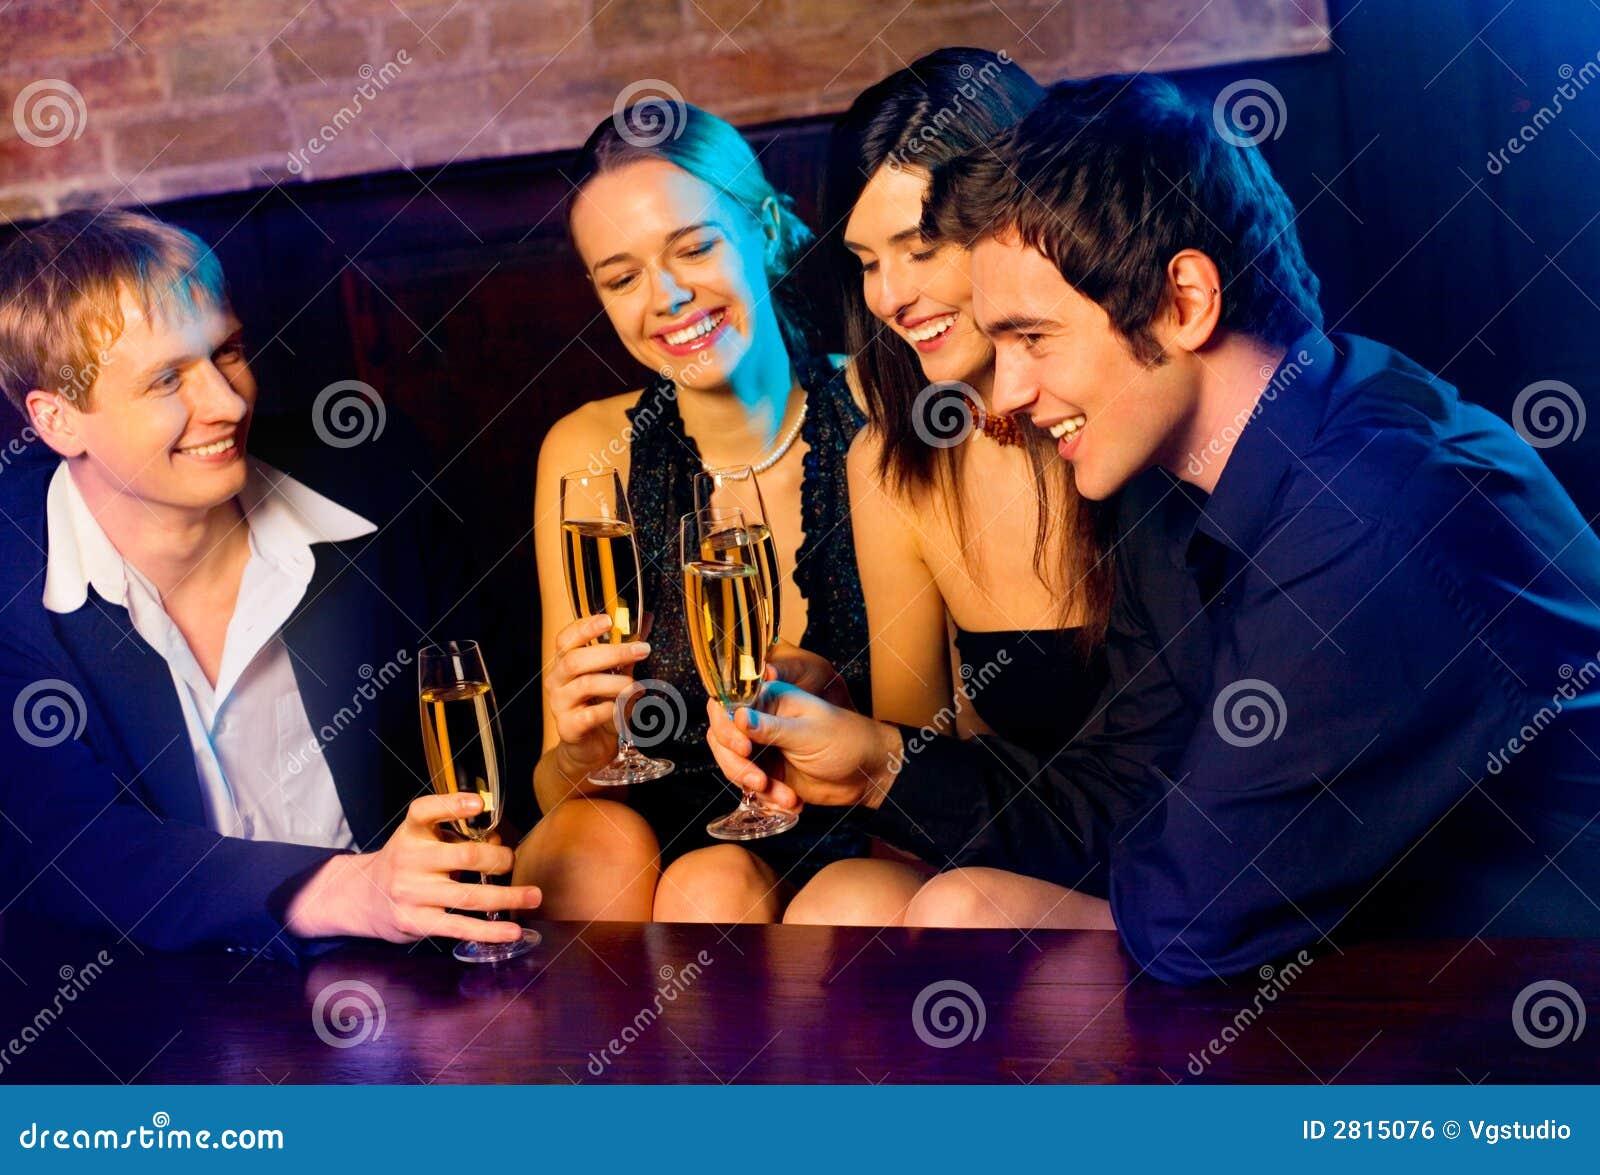 клуб для секс знакомств москва